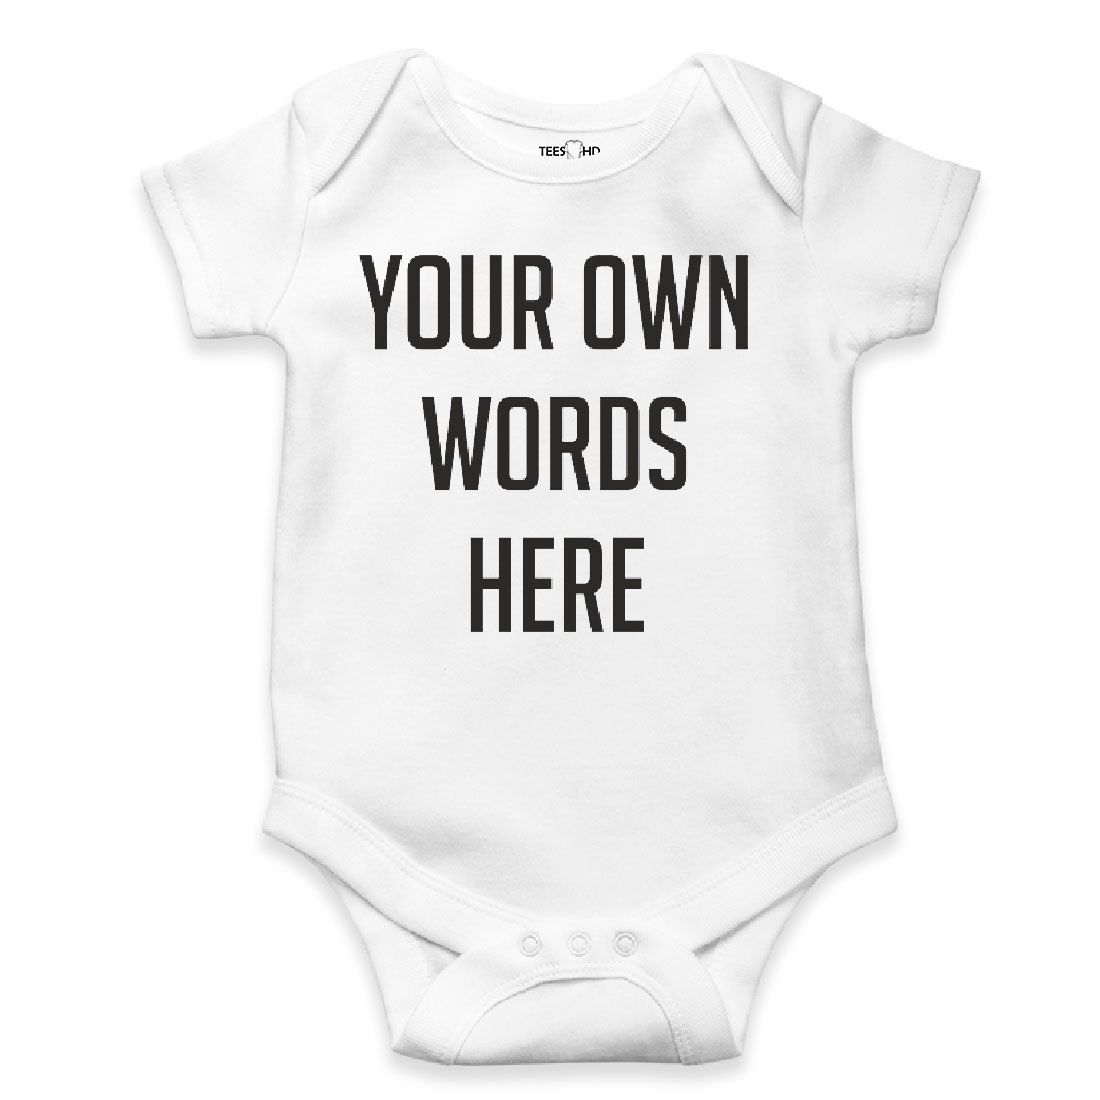 Personalized Bodysuit Custom Baby Vest